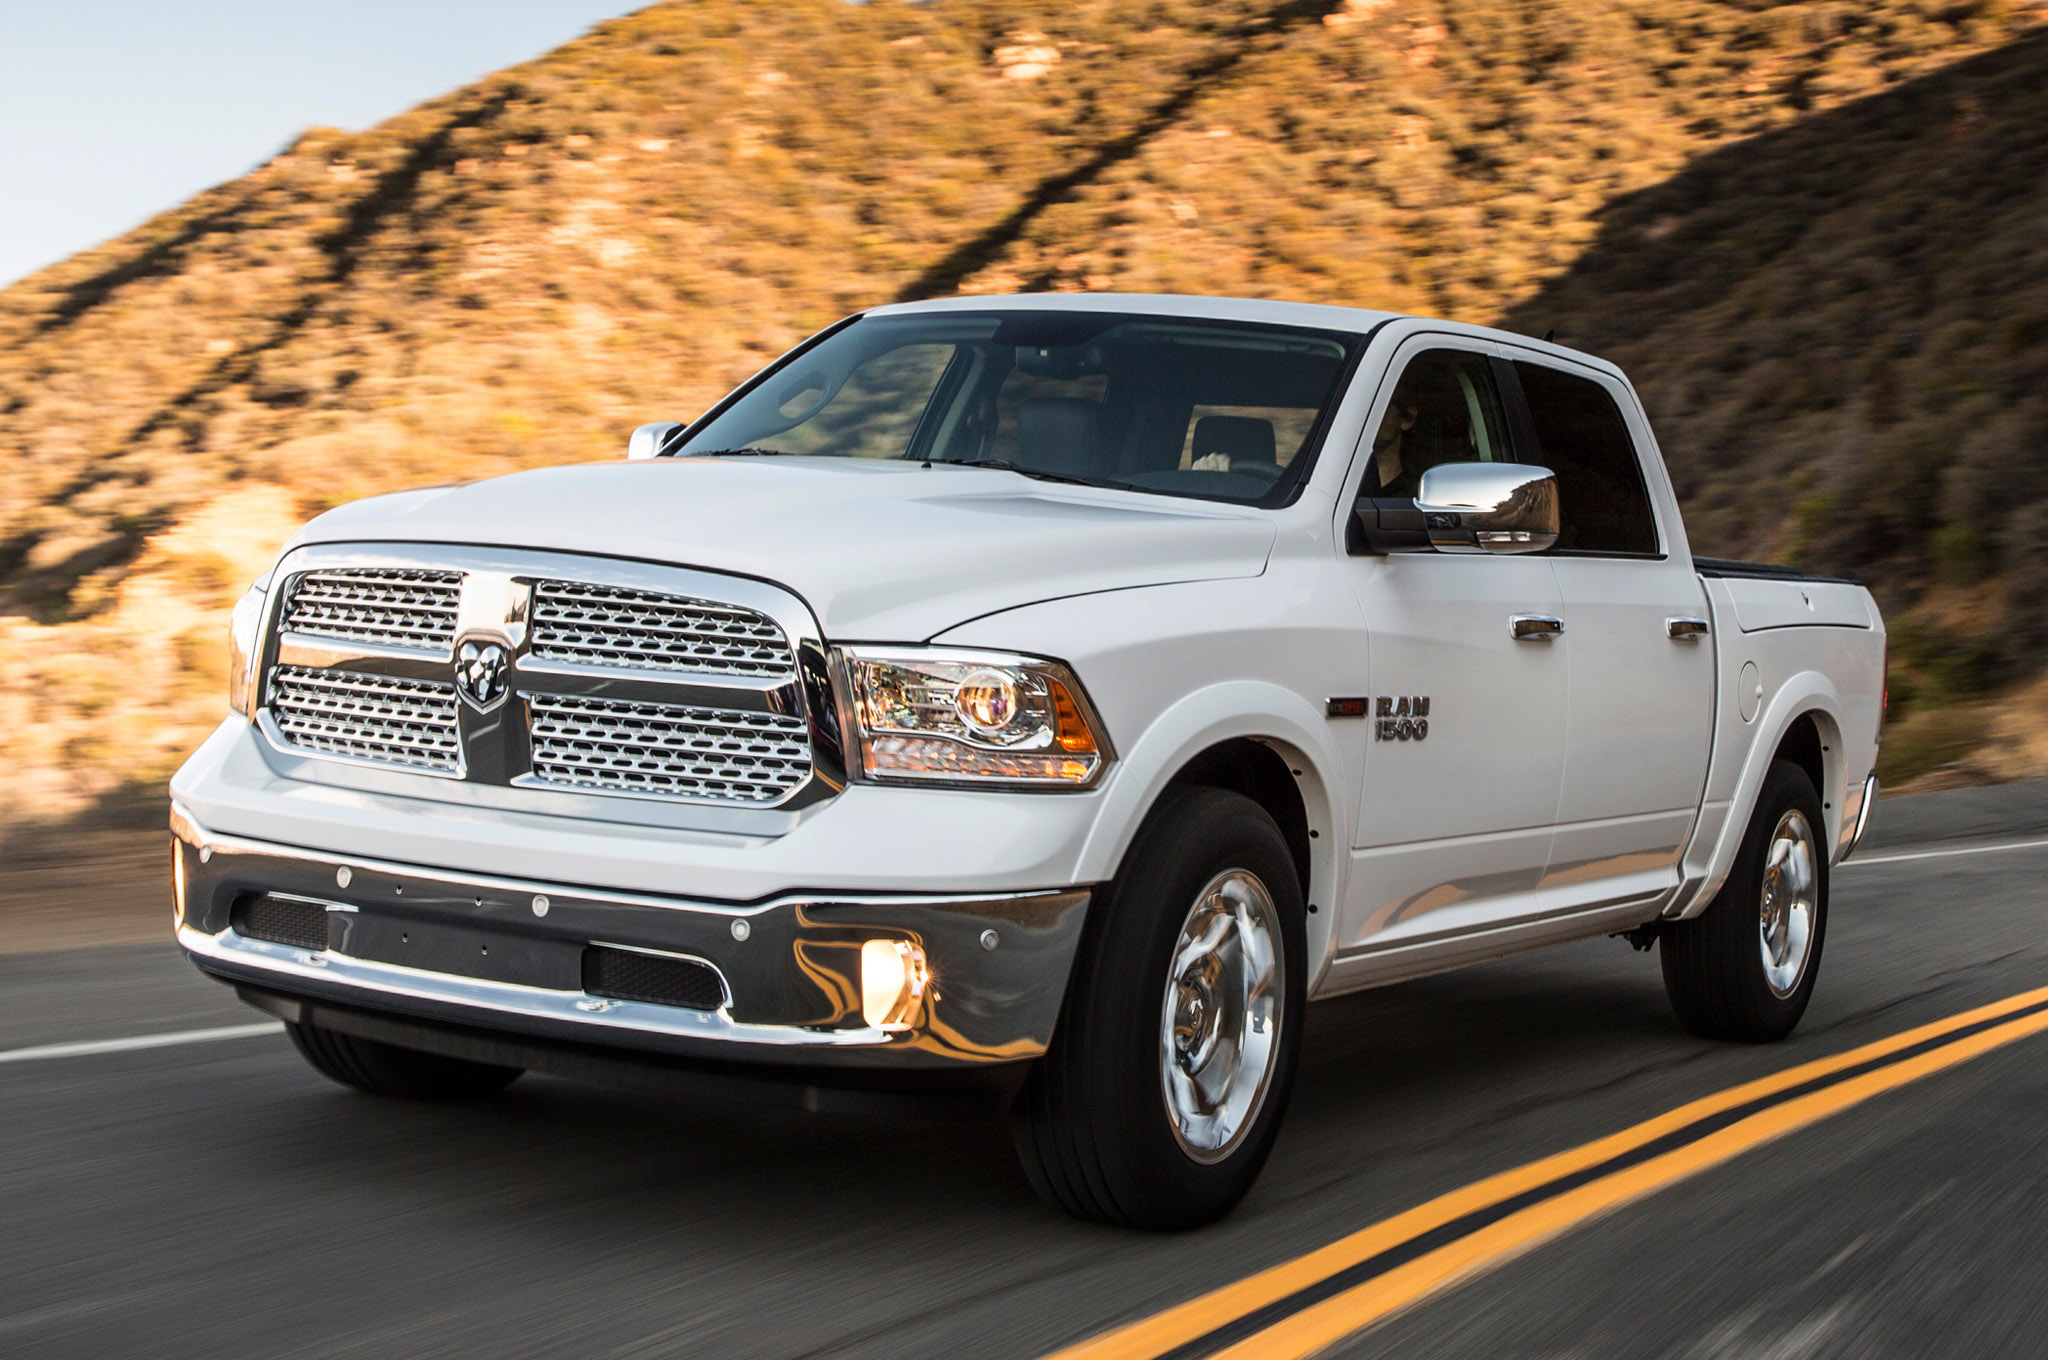 Ram 1500 Laramie >> 2014 Dodge Ram 1500 EcoDiesel Records Best Fuel Economy Rating